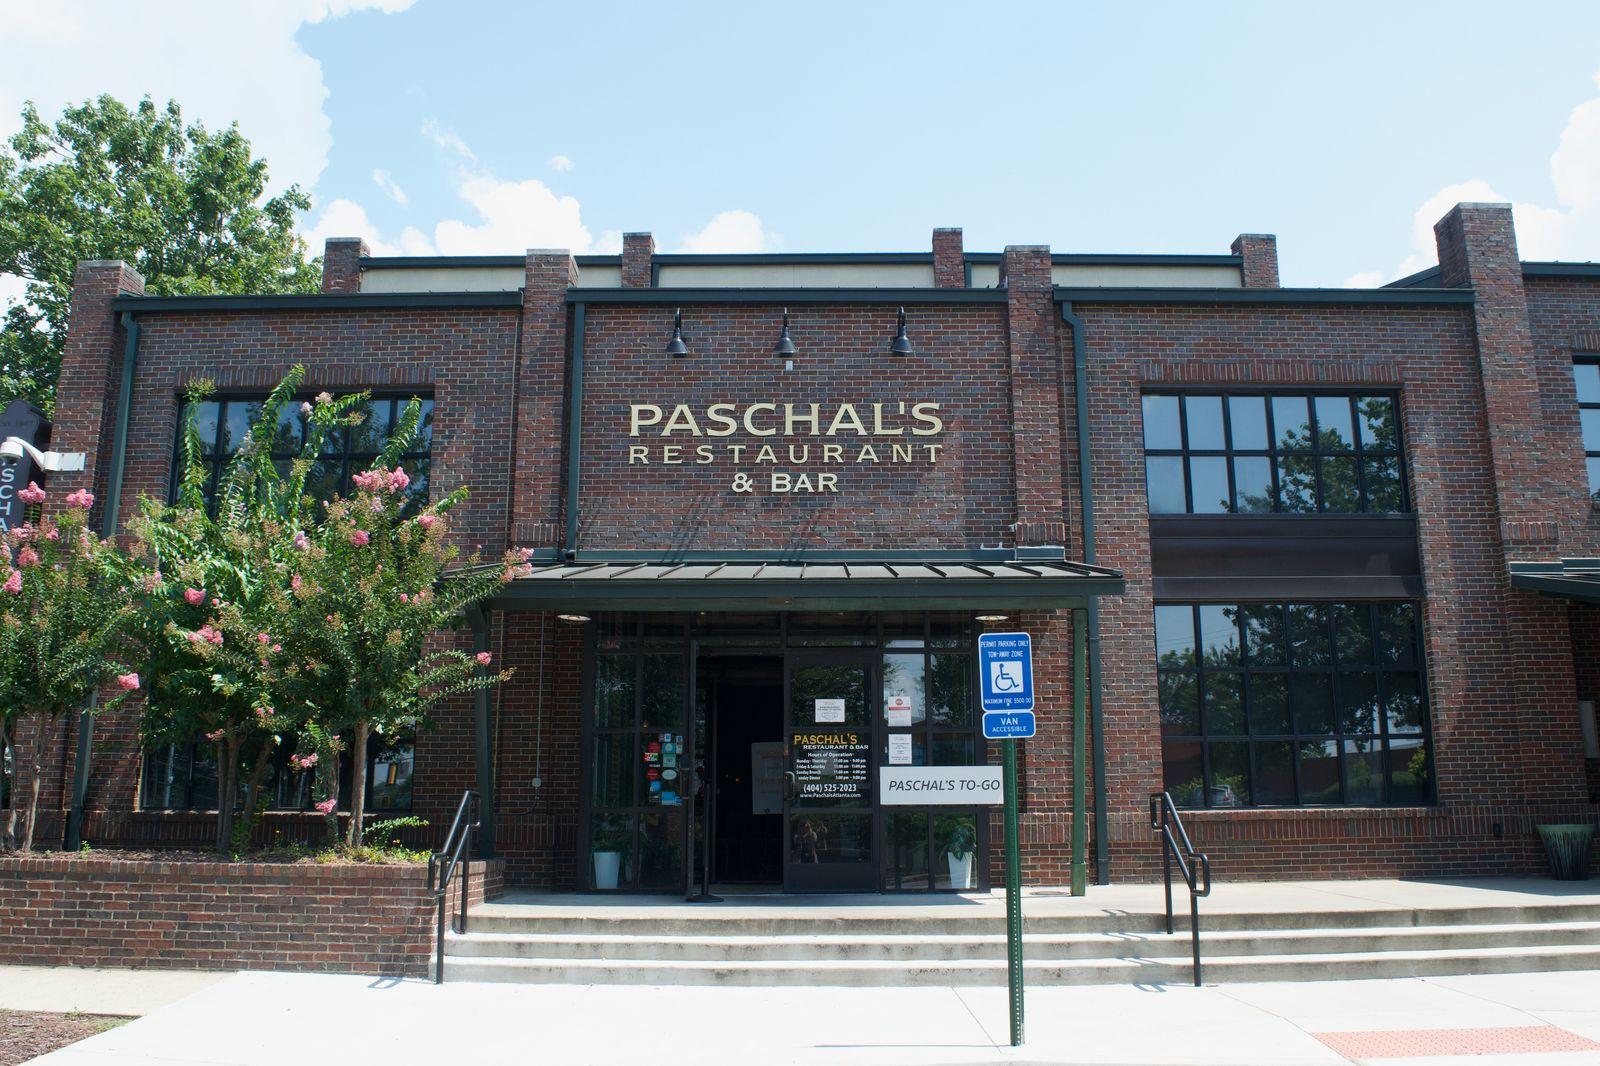 Paschal's restaurant frontage